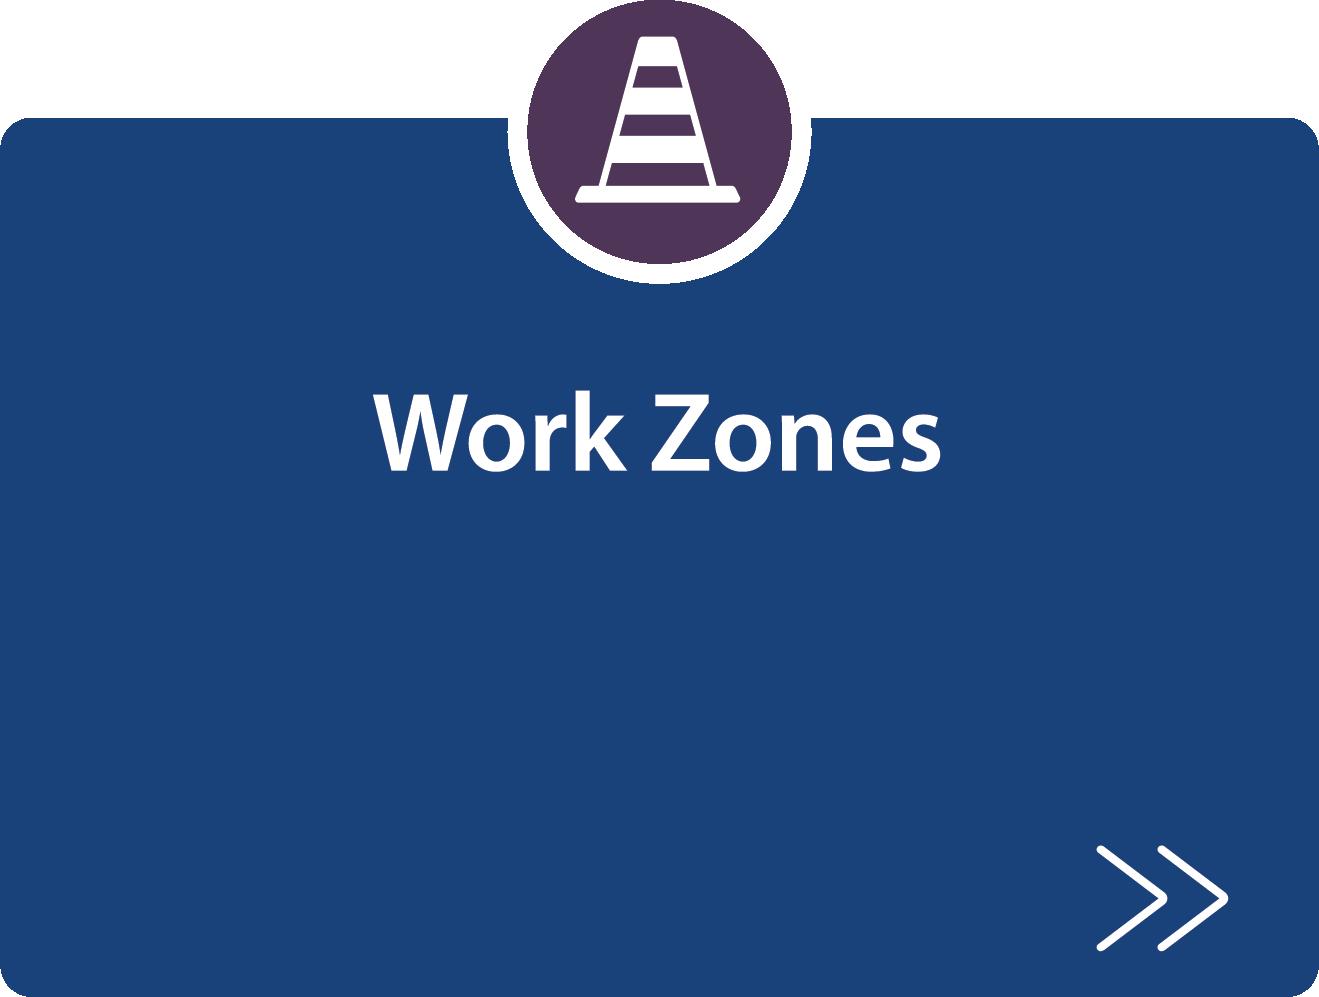 Work zones strategy description